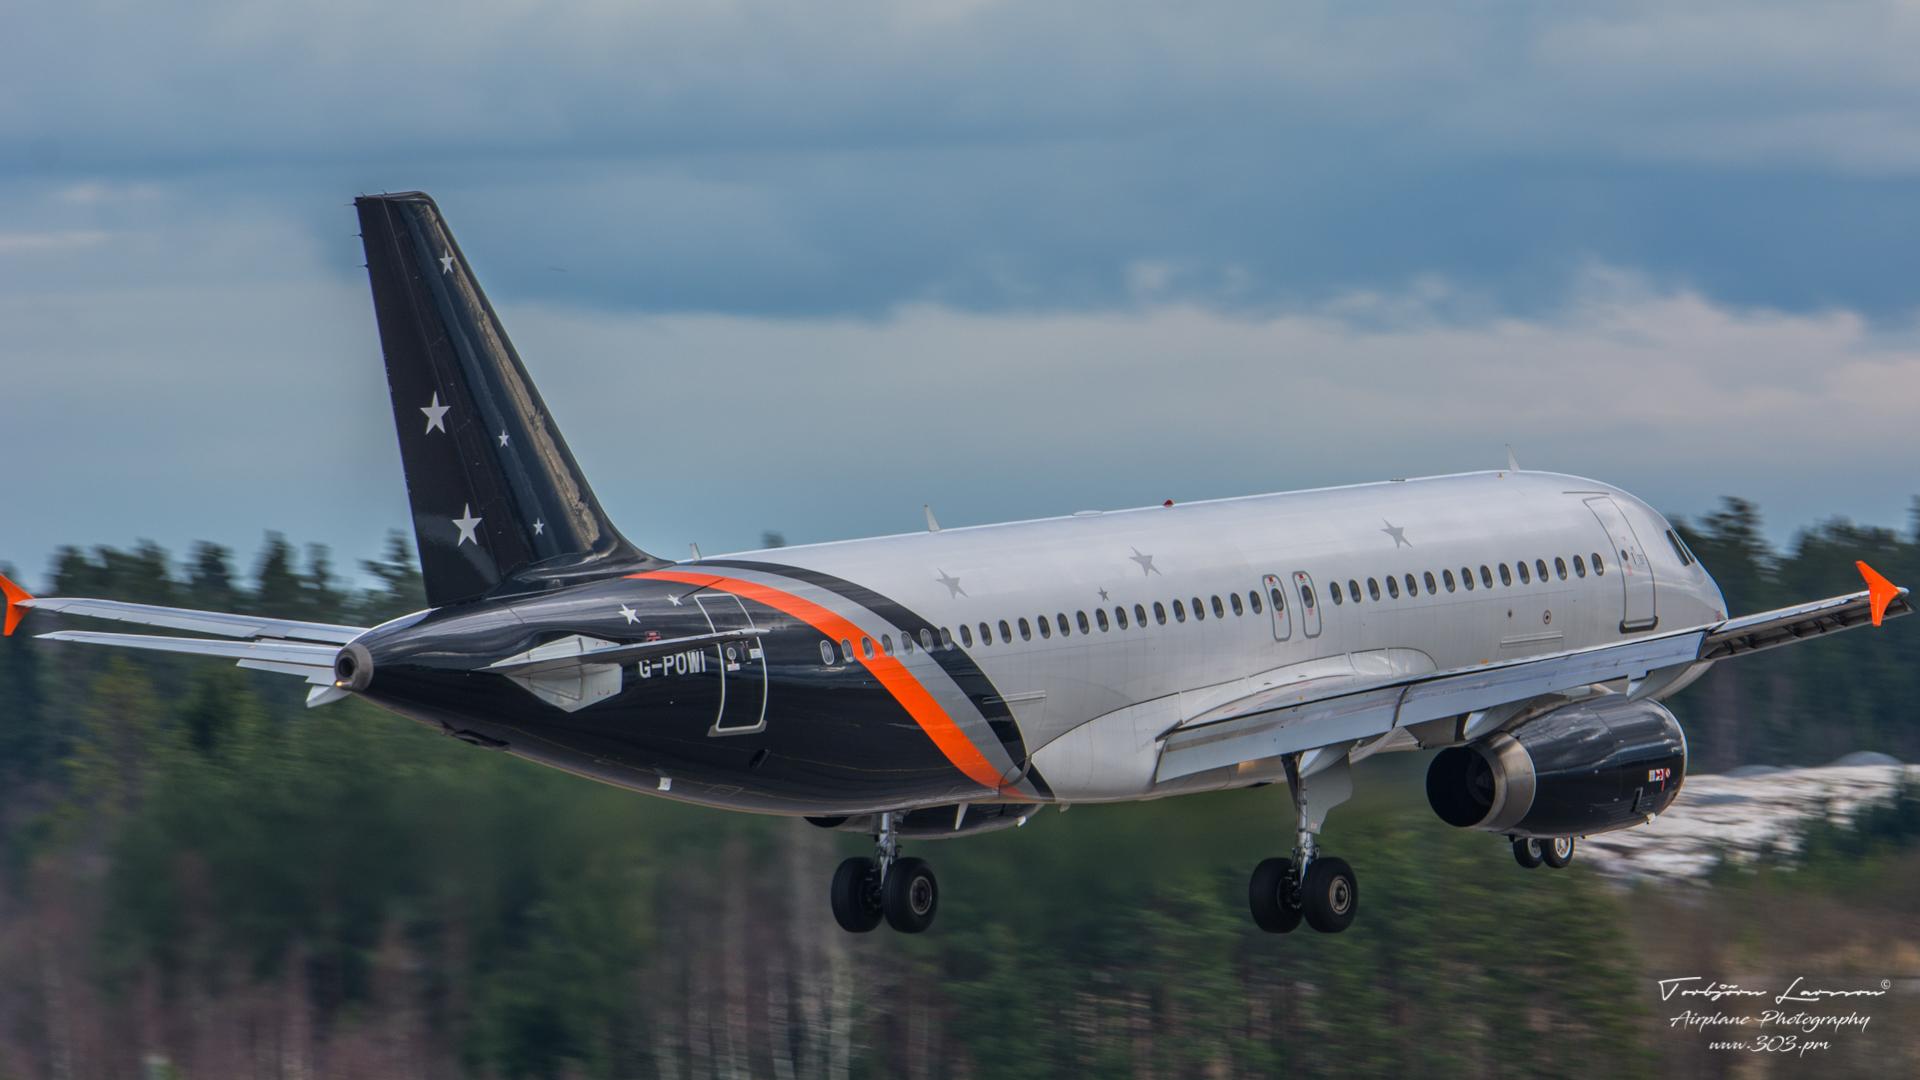 DSC_2599-Airbus A320-233 - Novair G-POWI